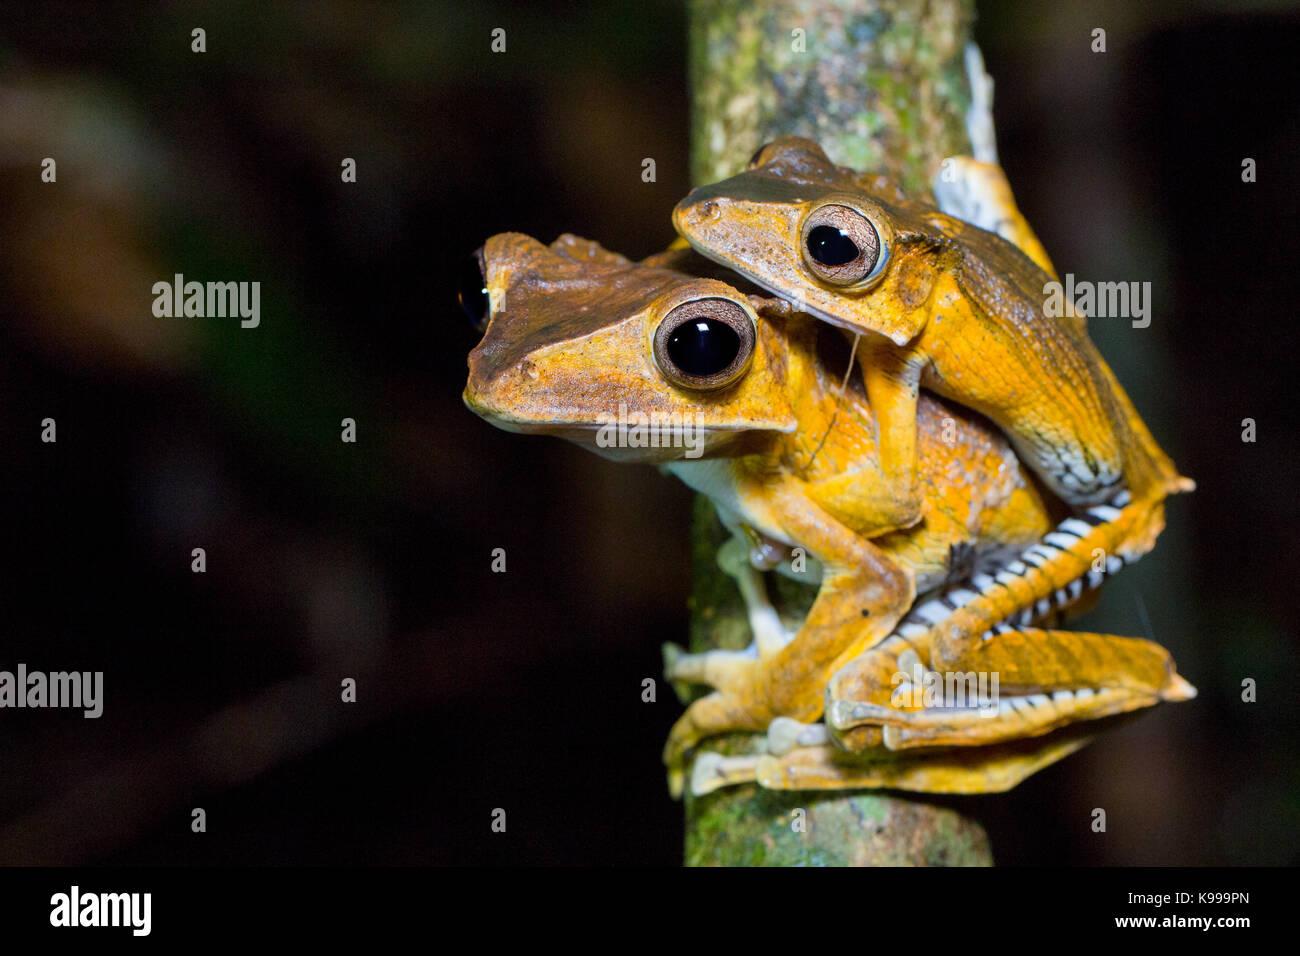 Polypedates otilophus (File-Eared Tree Frog) mating pair, Kubah National Park, Sarawak, Malaysia - Stock Image